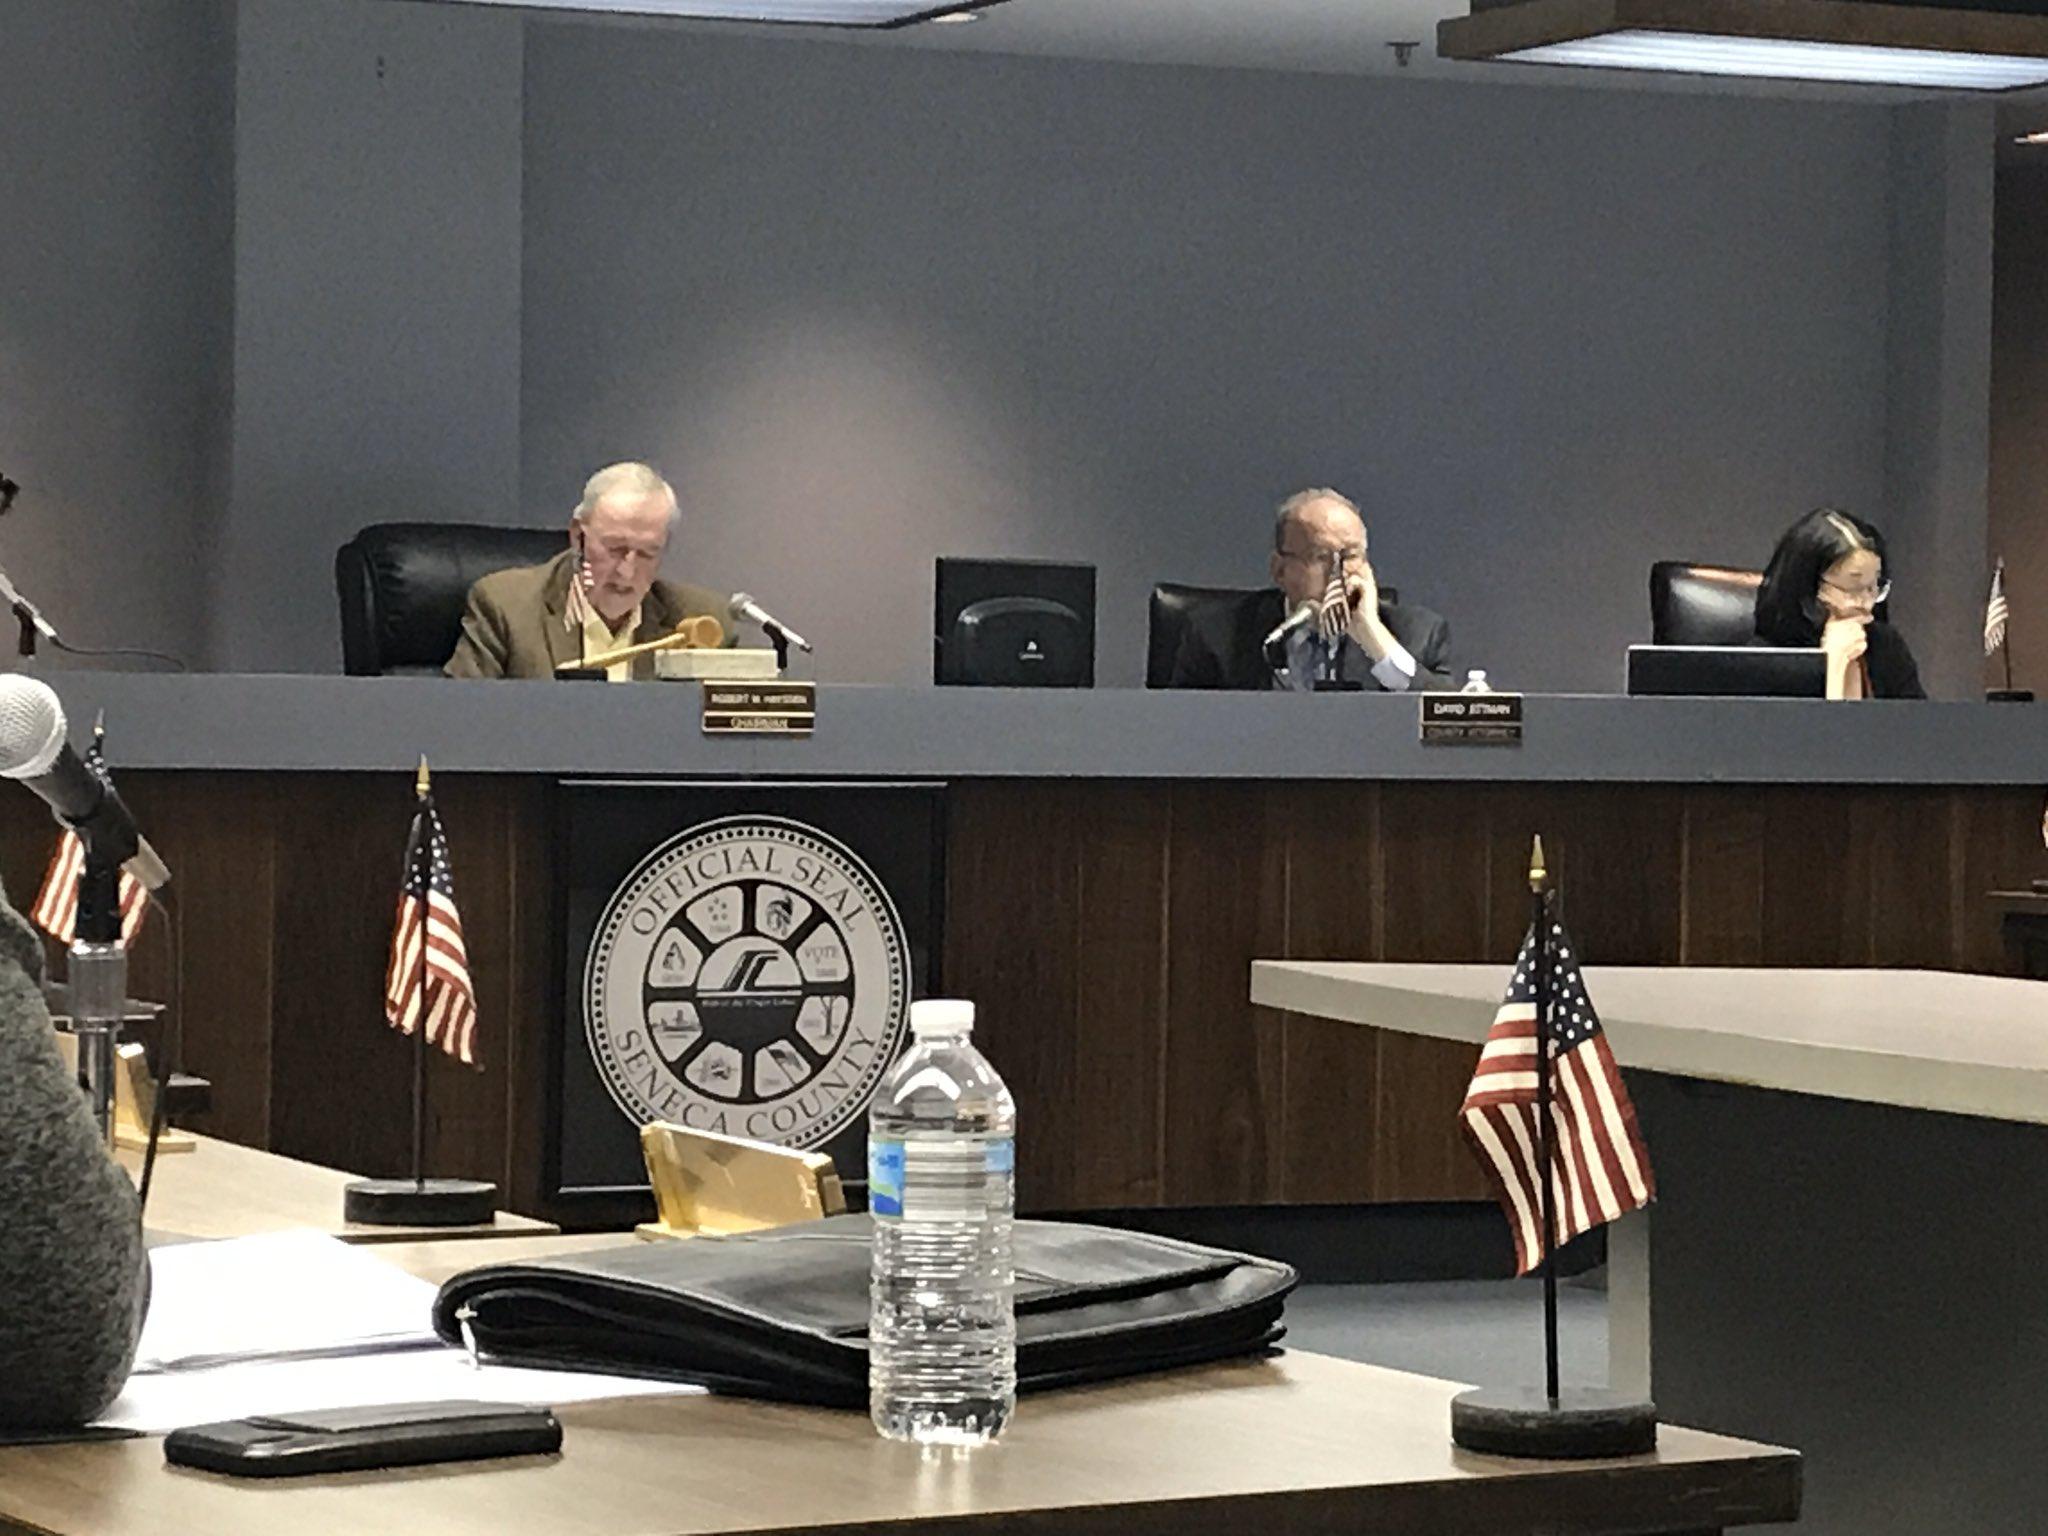 Bob Hayssen will lead Seneca County Board of Supervisors in 2020